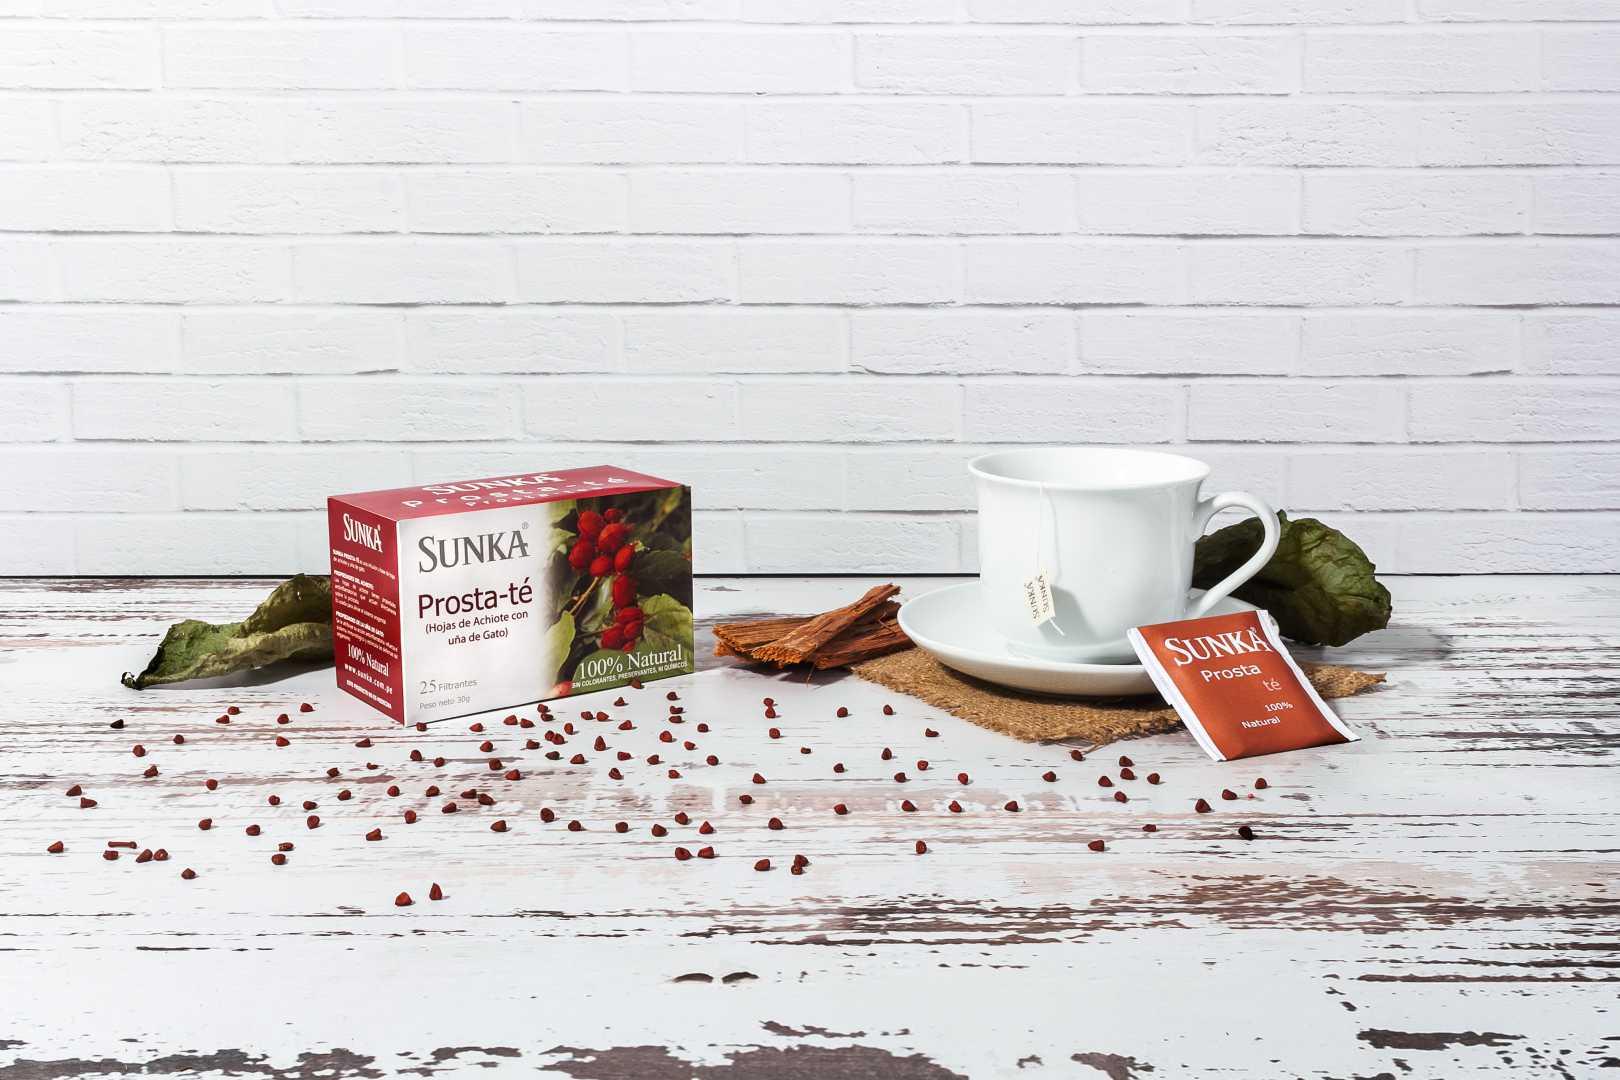 sunka herbal tea prosta te